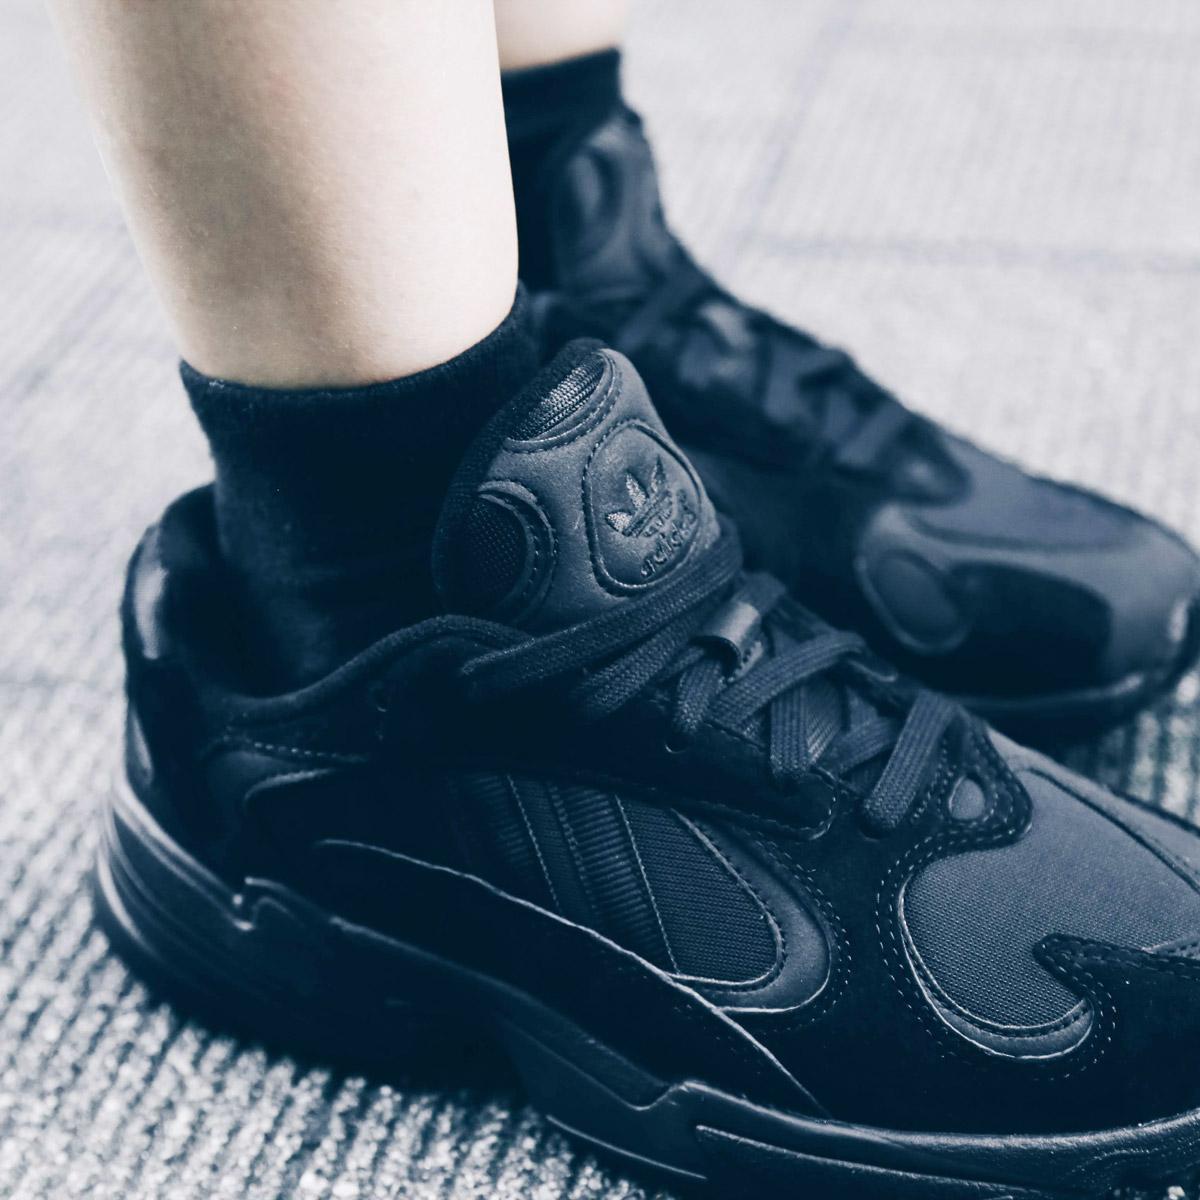 adidas Originals YUNG 1 (Adidas originals young people 1) CORE BLACKCORE BLACKCARBON 18FW I